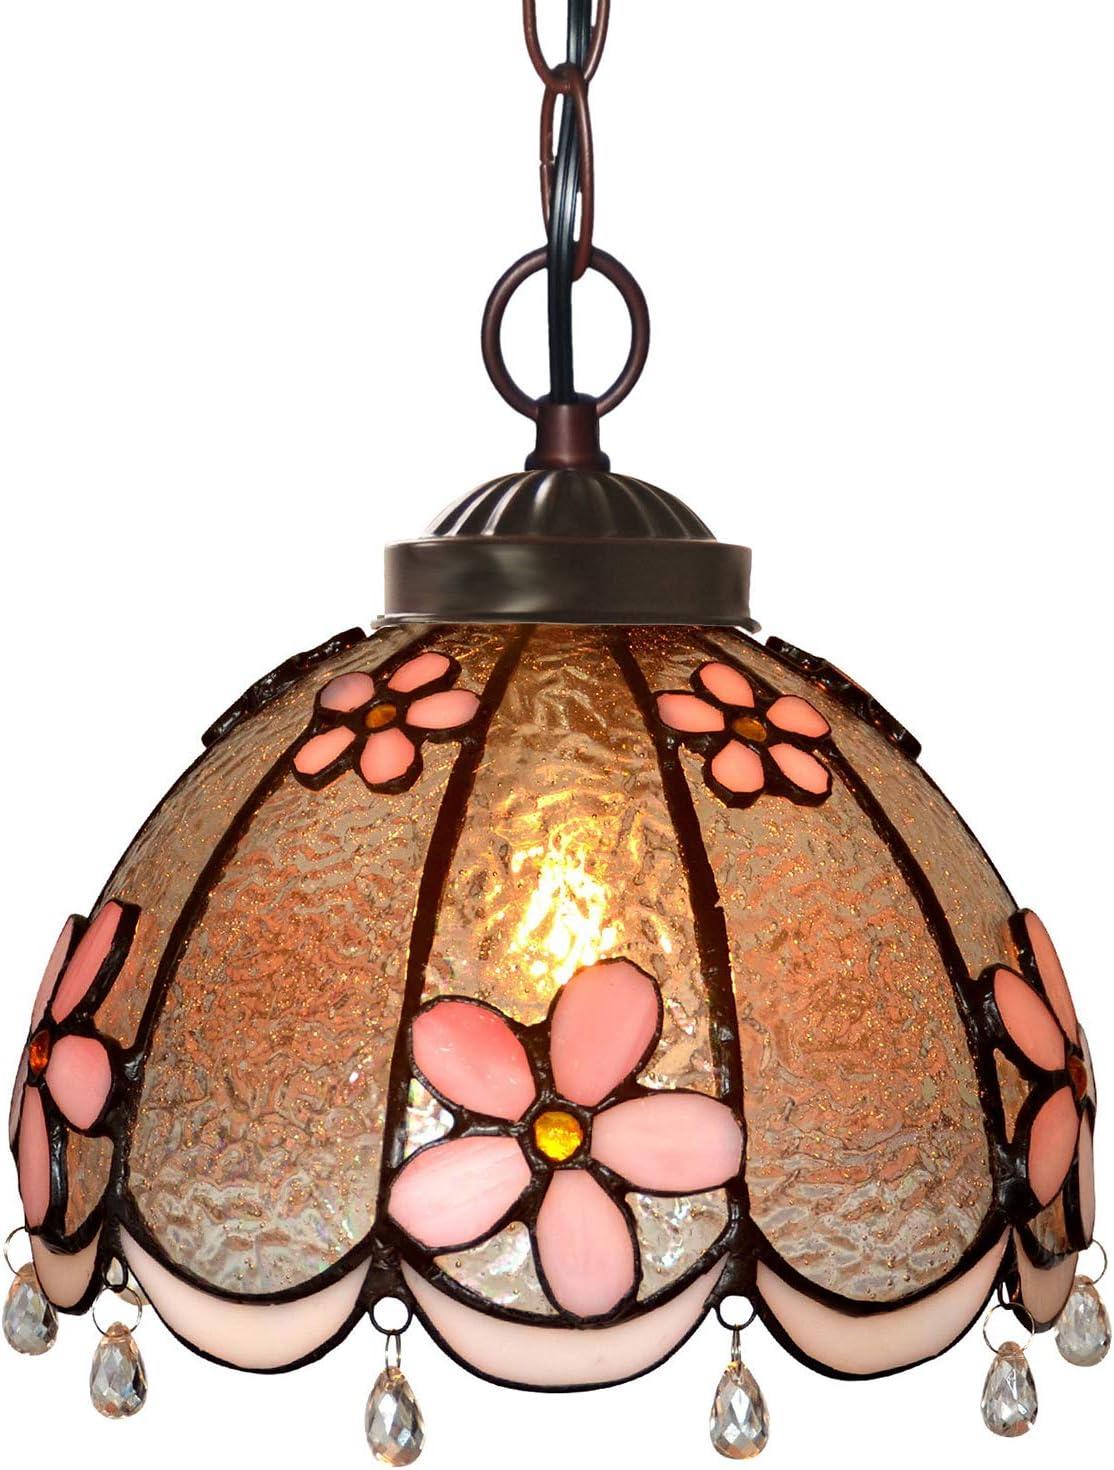 AIBOTY Max 64% OFF Tiffany Style Pendant 1 year warranty Light Hanging 8